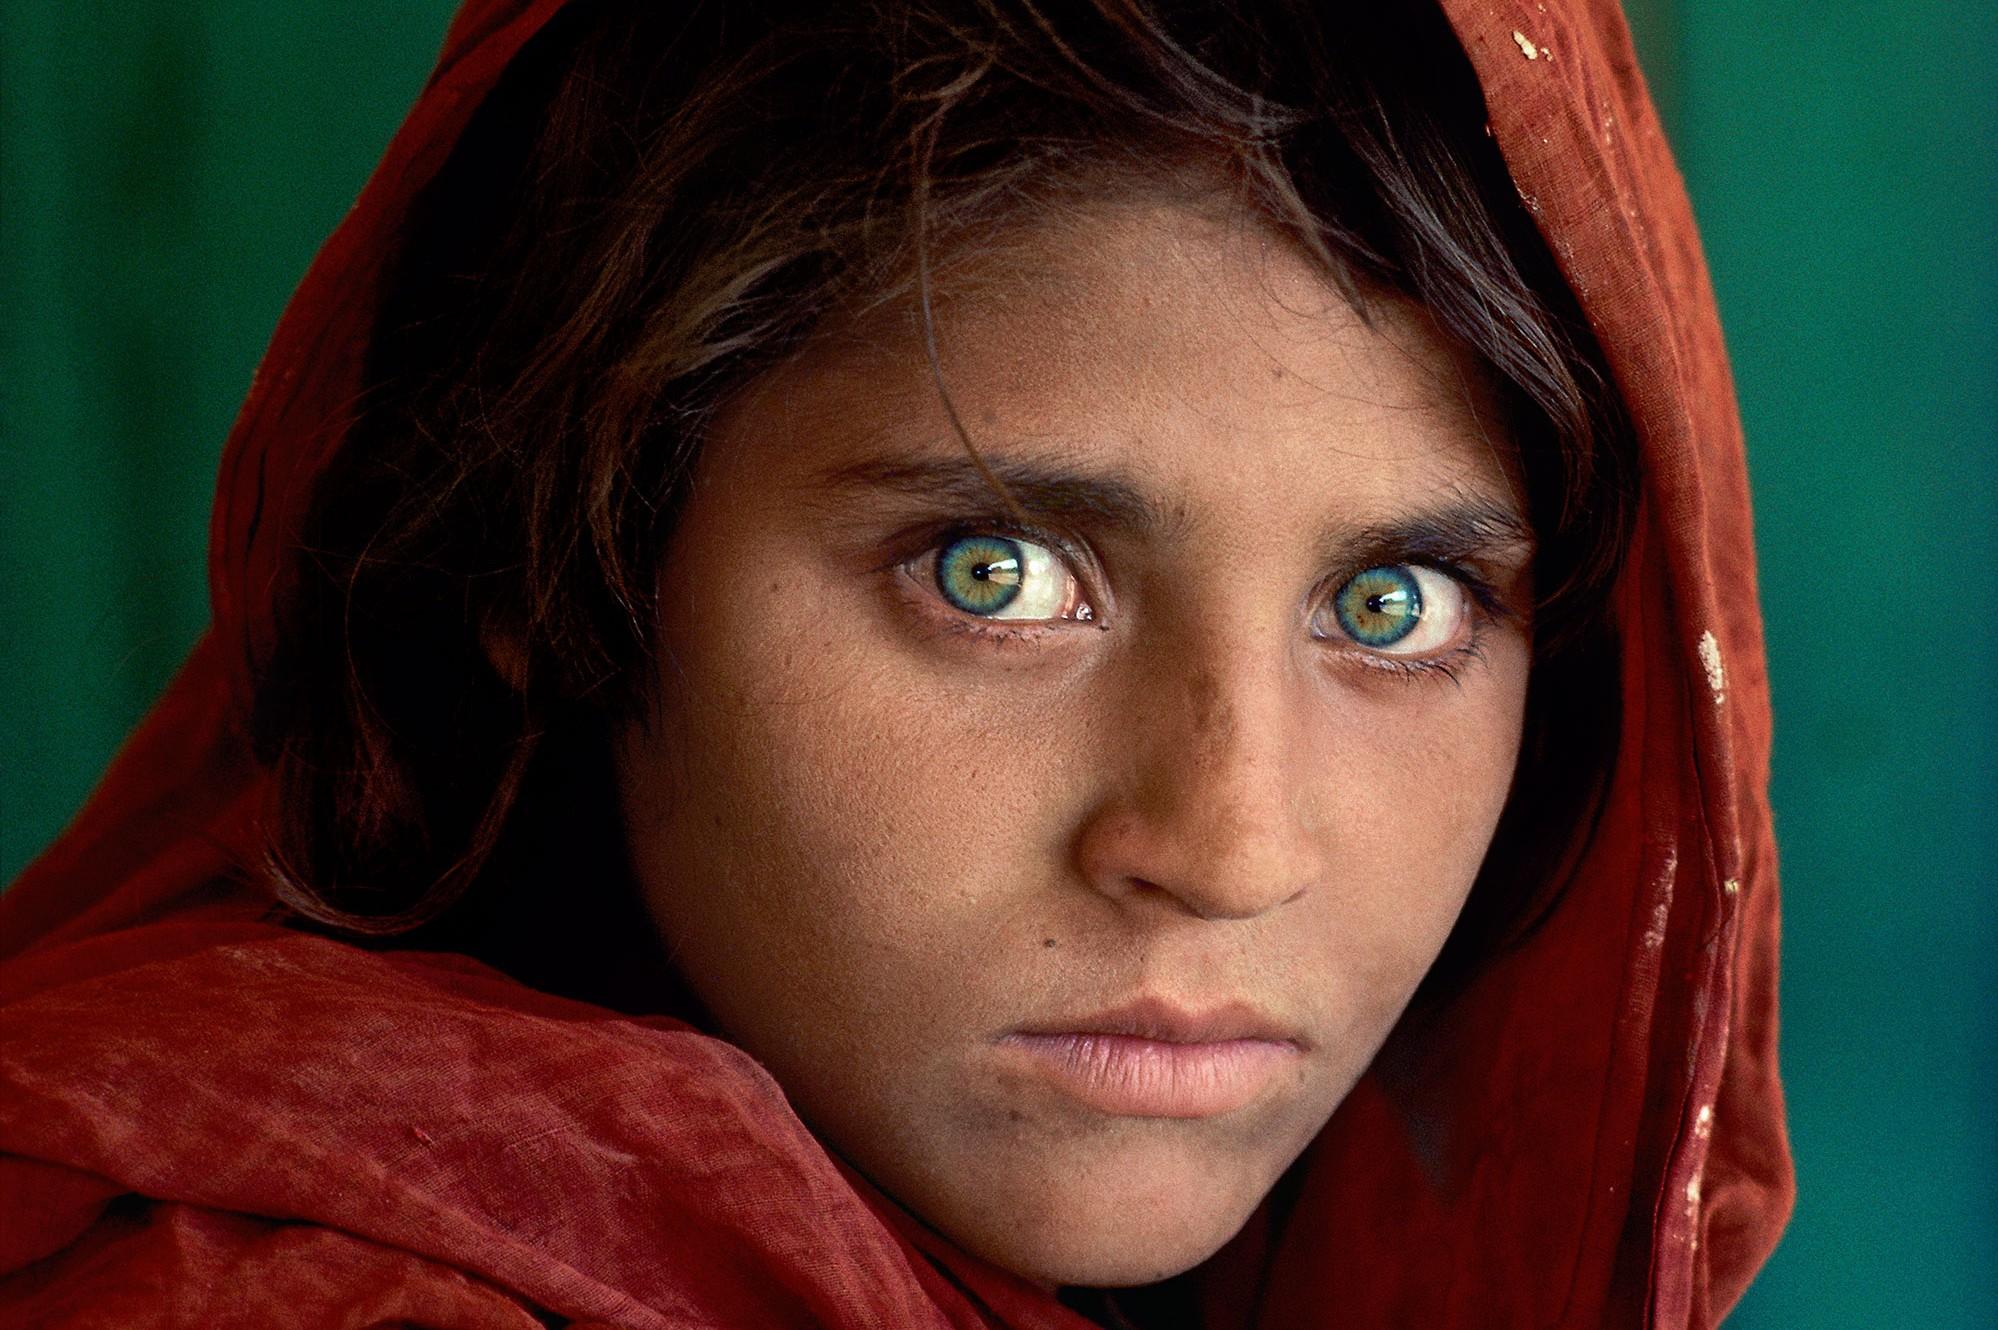 Steve McCurry, Peshawar, Pakistan, 1984 (particolare) © Steve McCurry